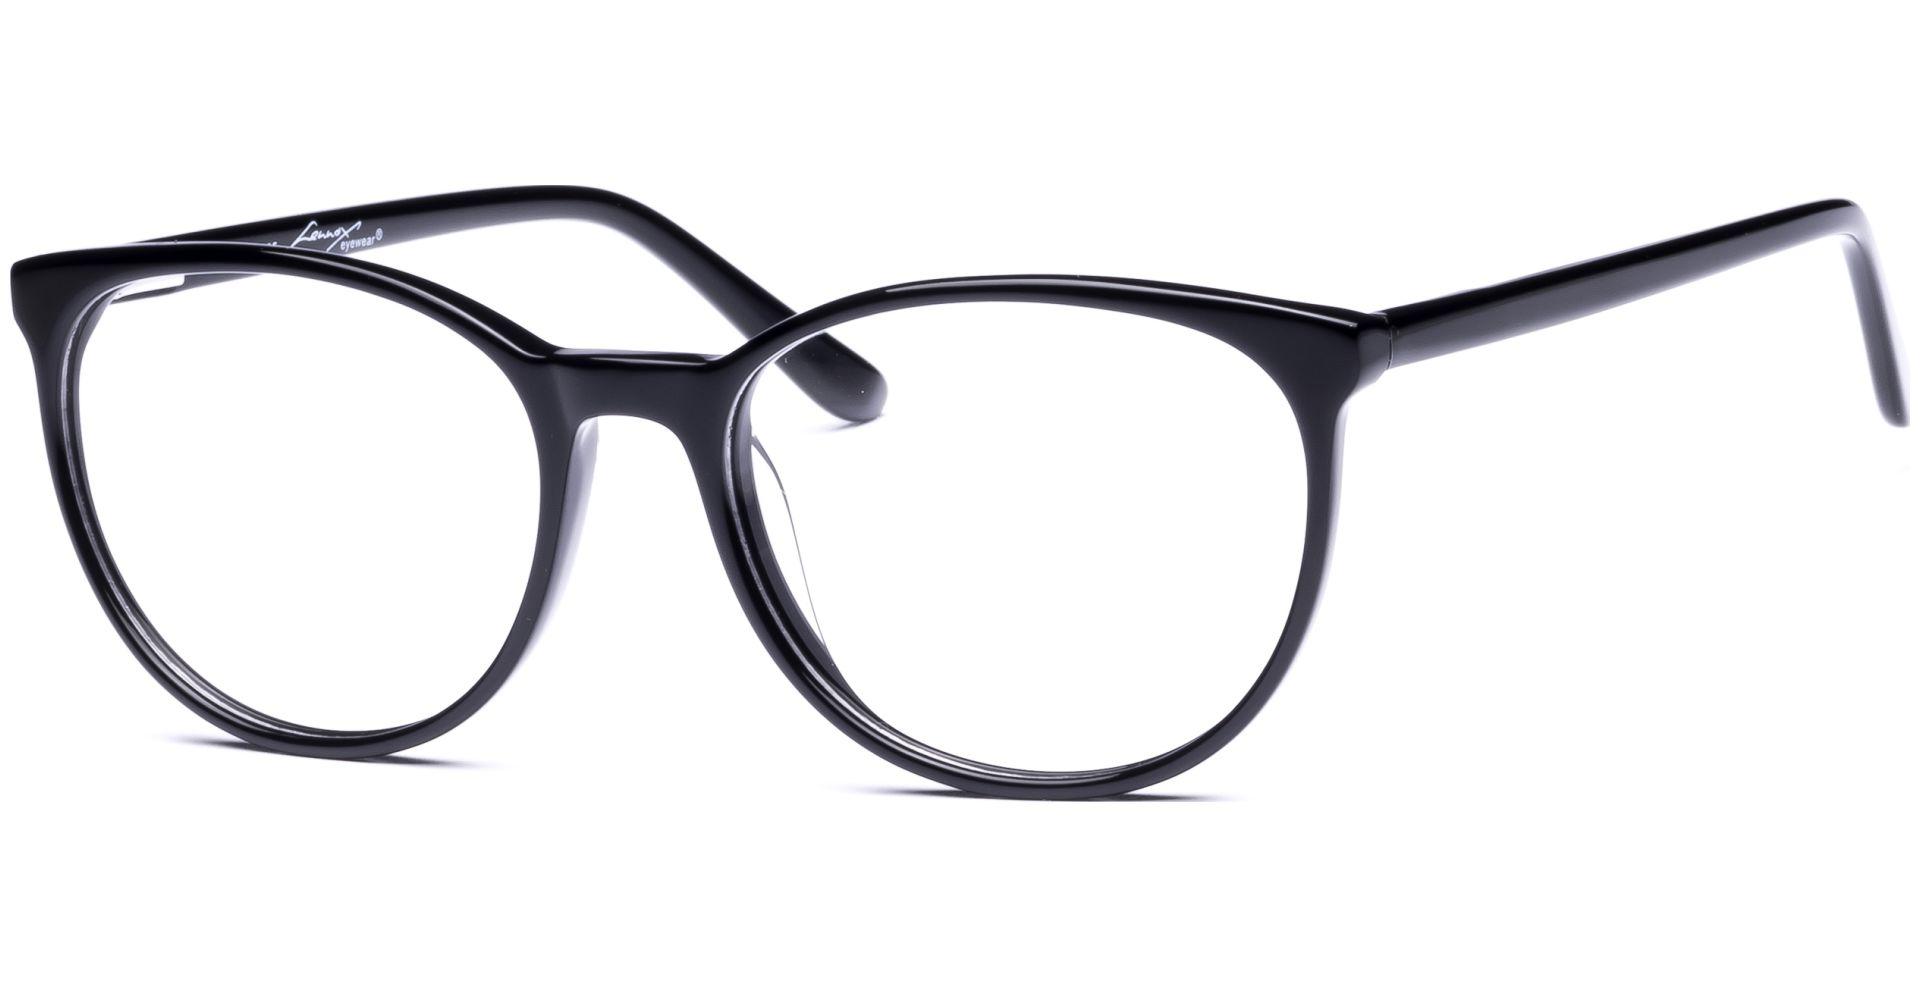 Lennox Eyewear - Nela 5317 schwarz - von Lensbest